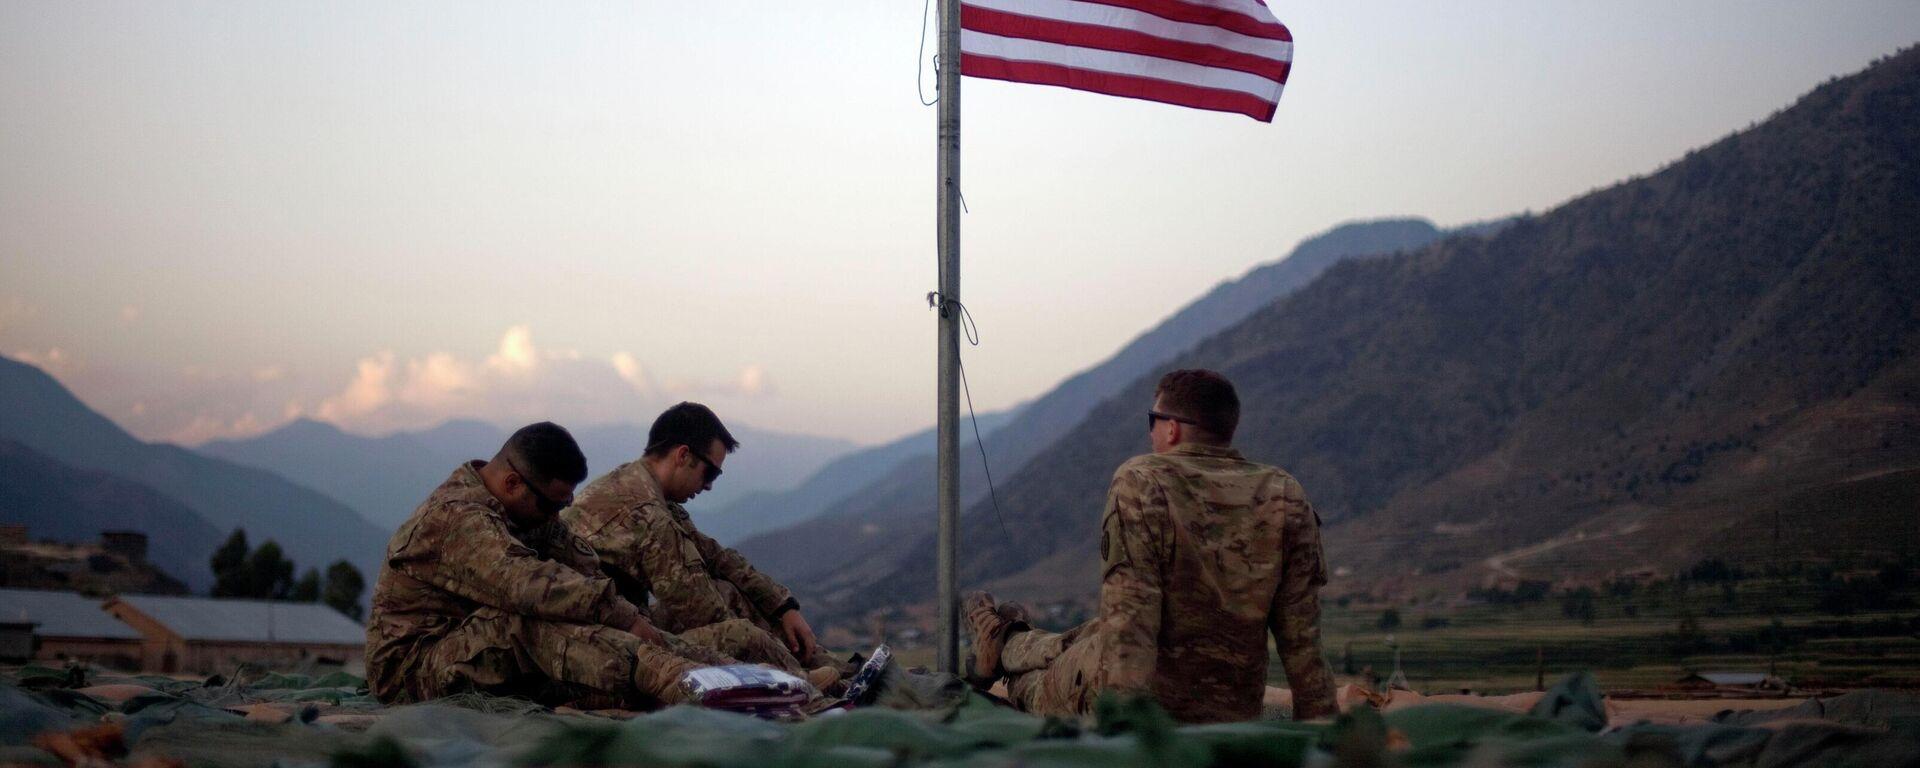 Militares de EEUU en Afganistán - Sputnik Mundo, 1920, 21.08.2021